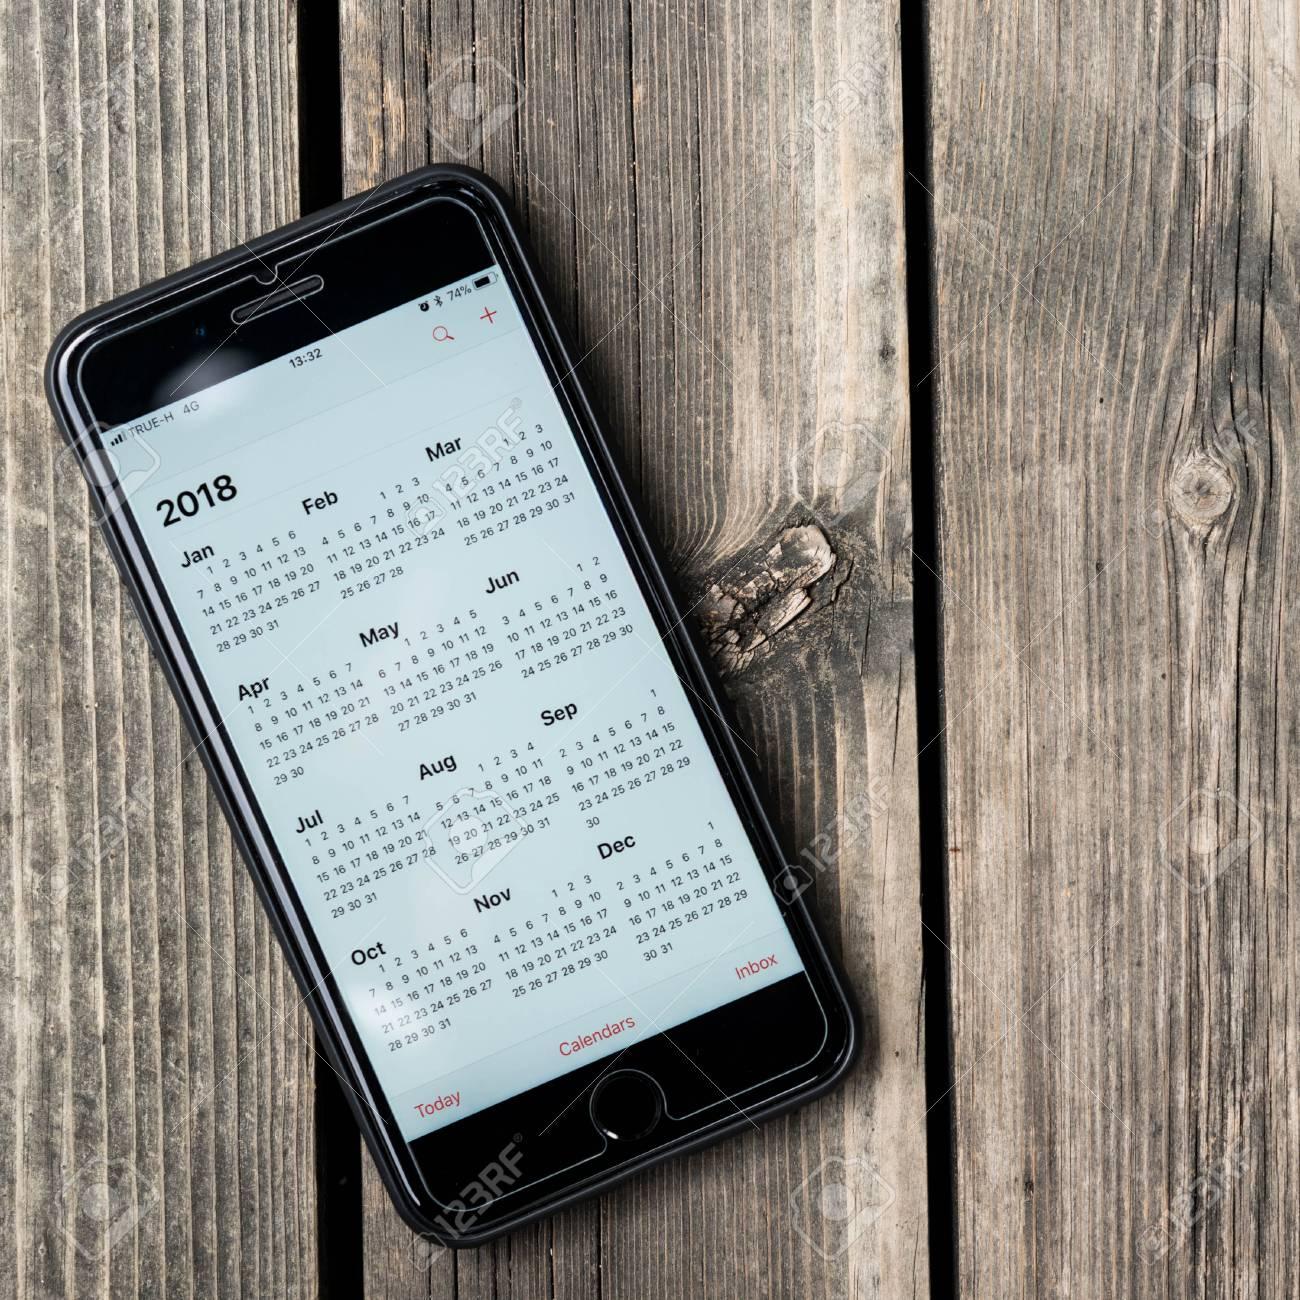 bangkok thailand november 26th 2017 iphone 8 plus show calendar of 2018